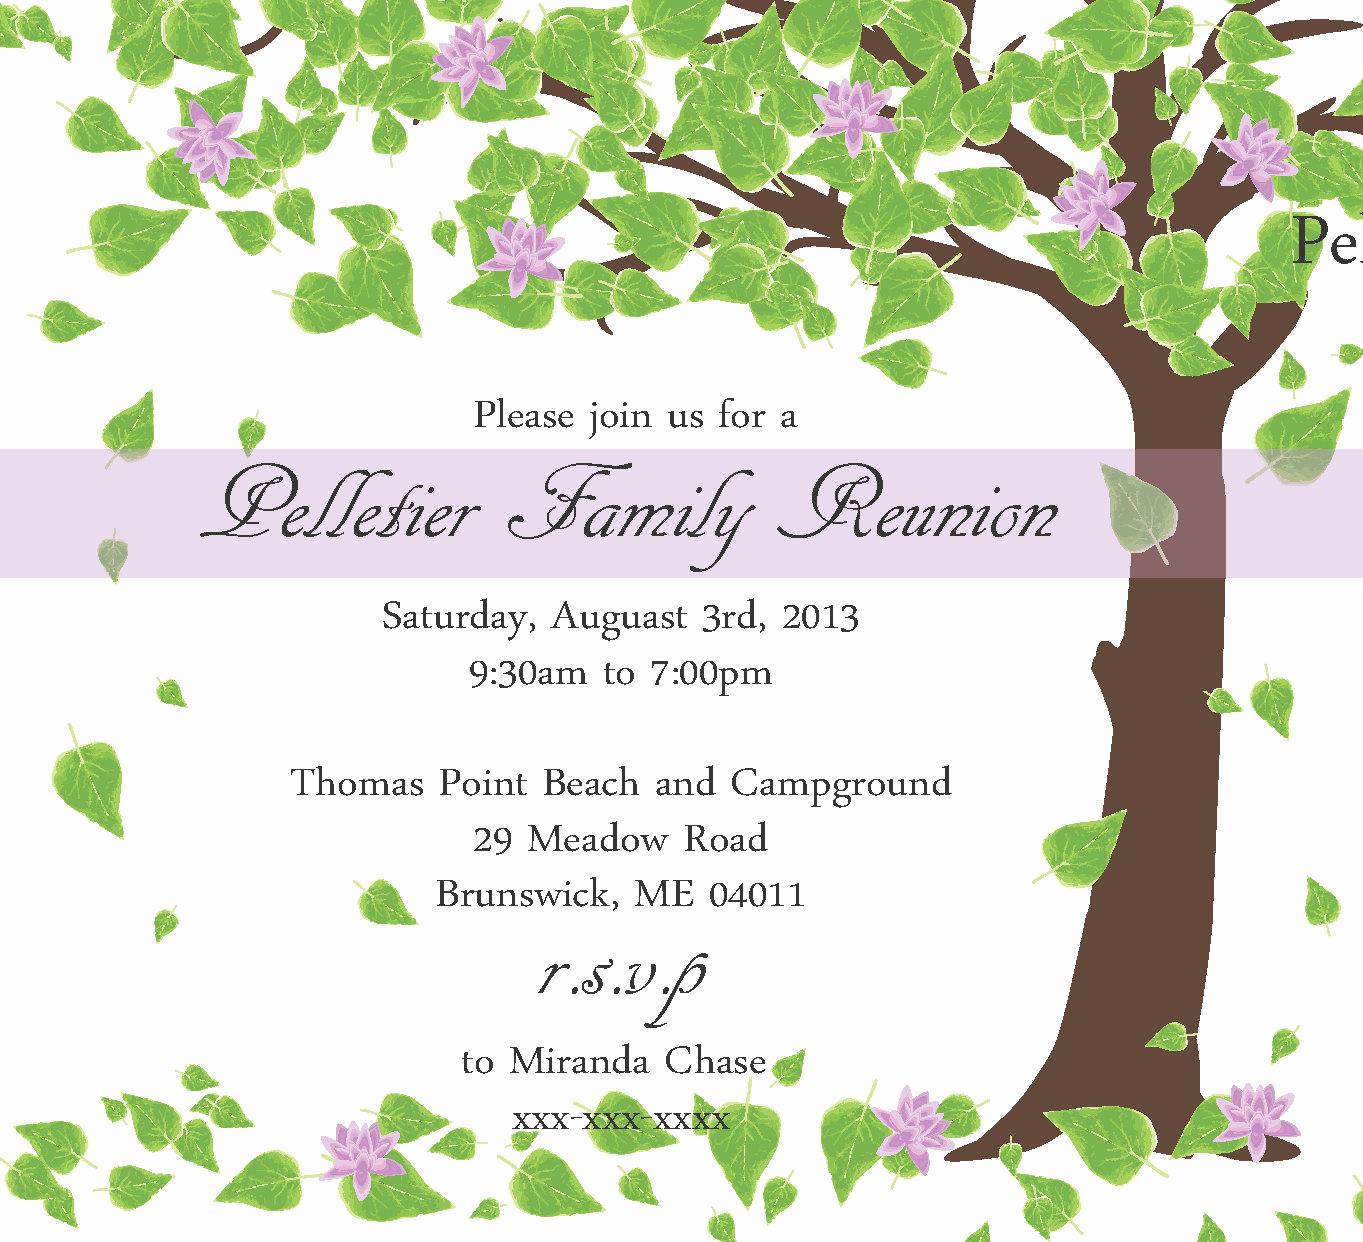 Family Reunion Invitation Templates Luxury Family Reunion Invitation by Littlebopress On Etsy